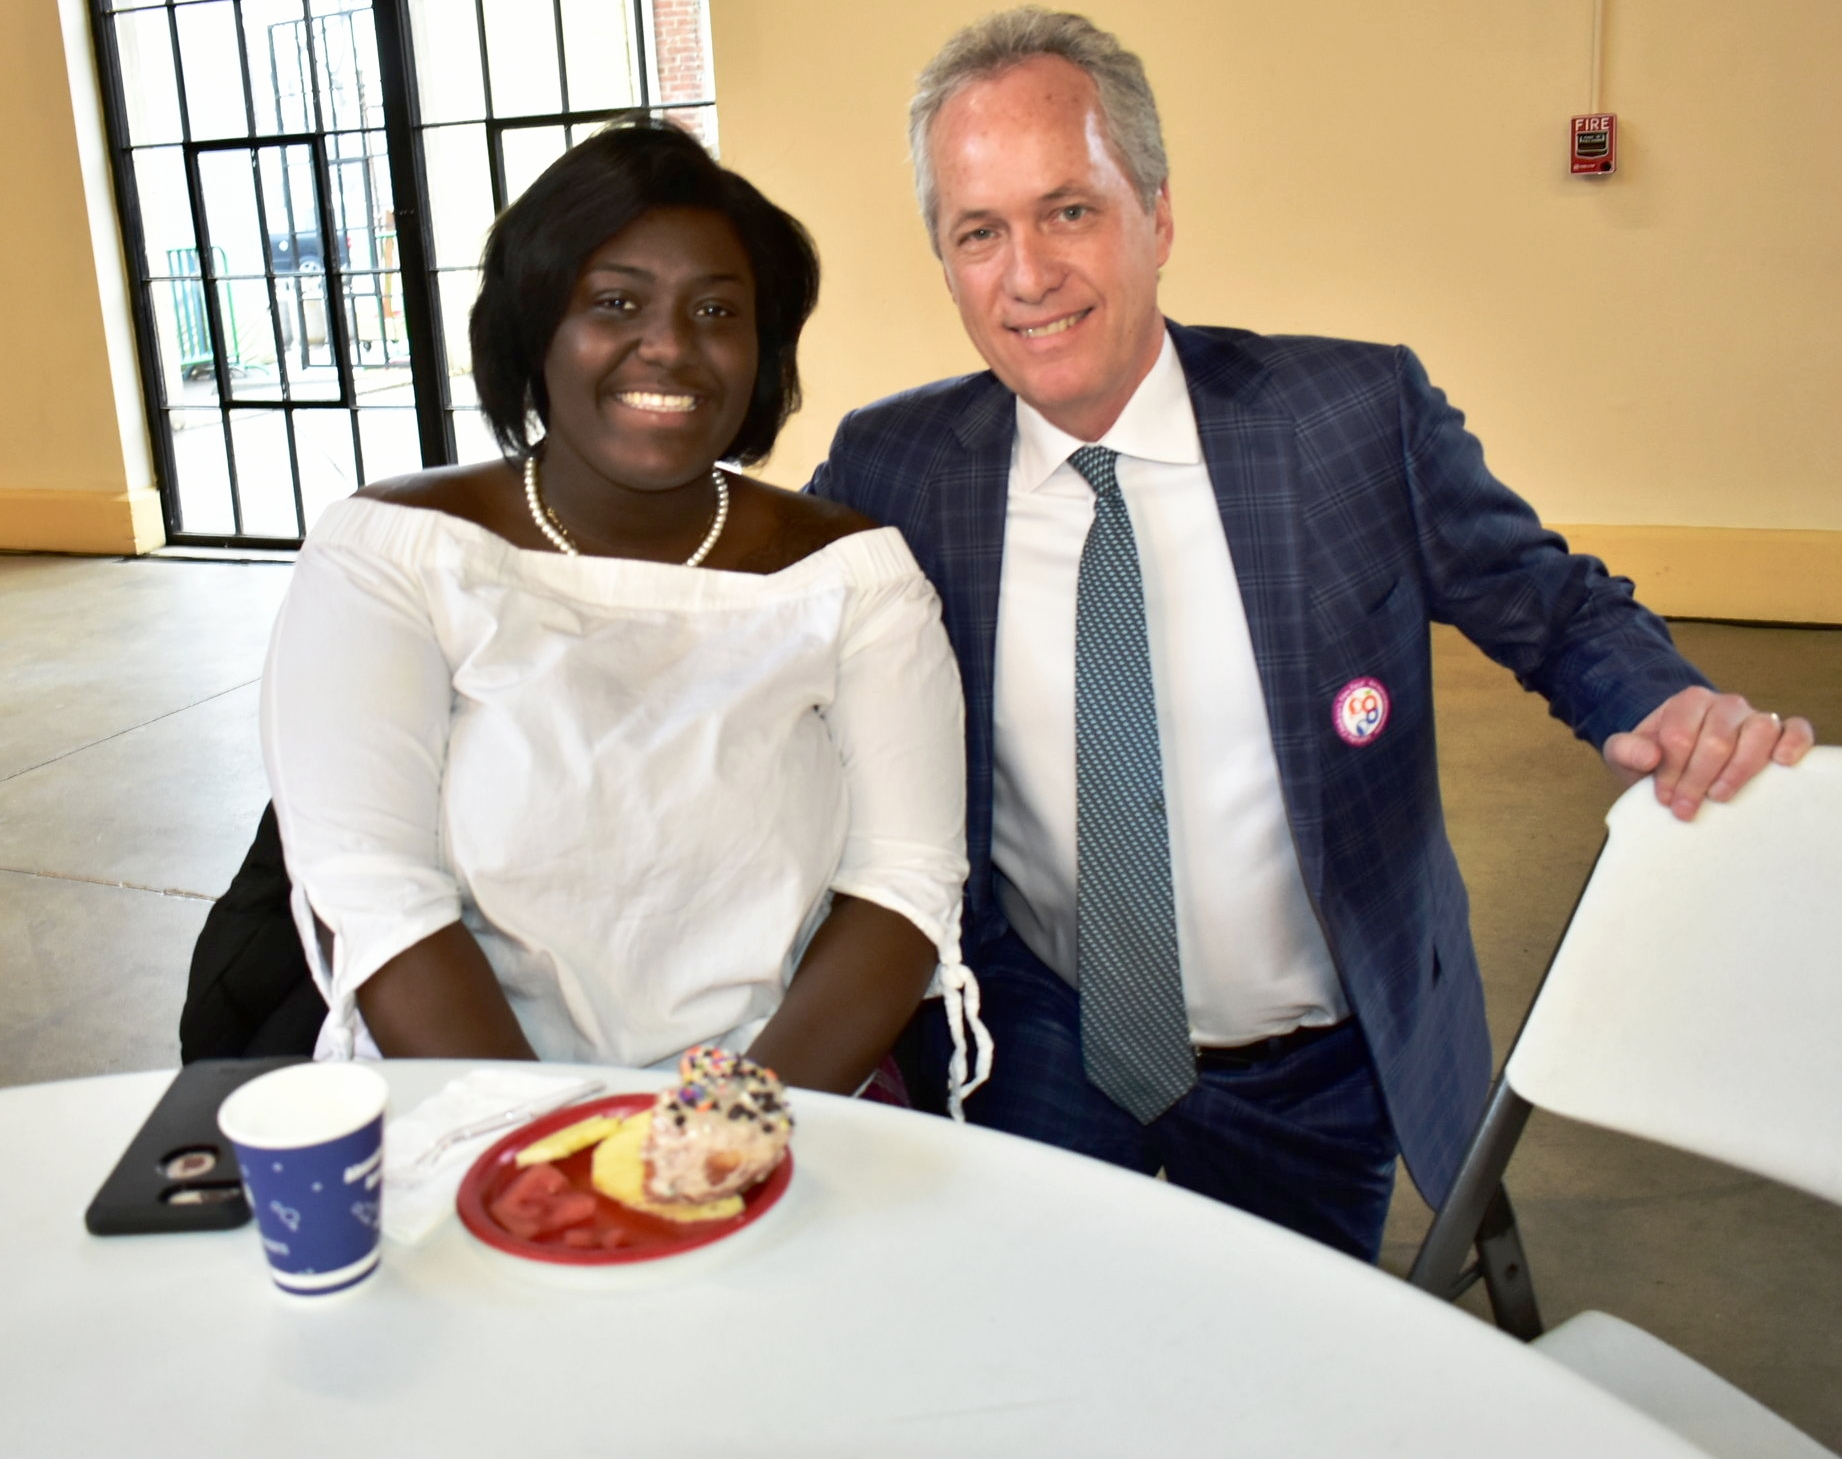 LVA student Donielle Pankey with Mayor Greg Fischer